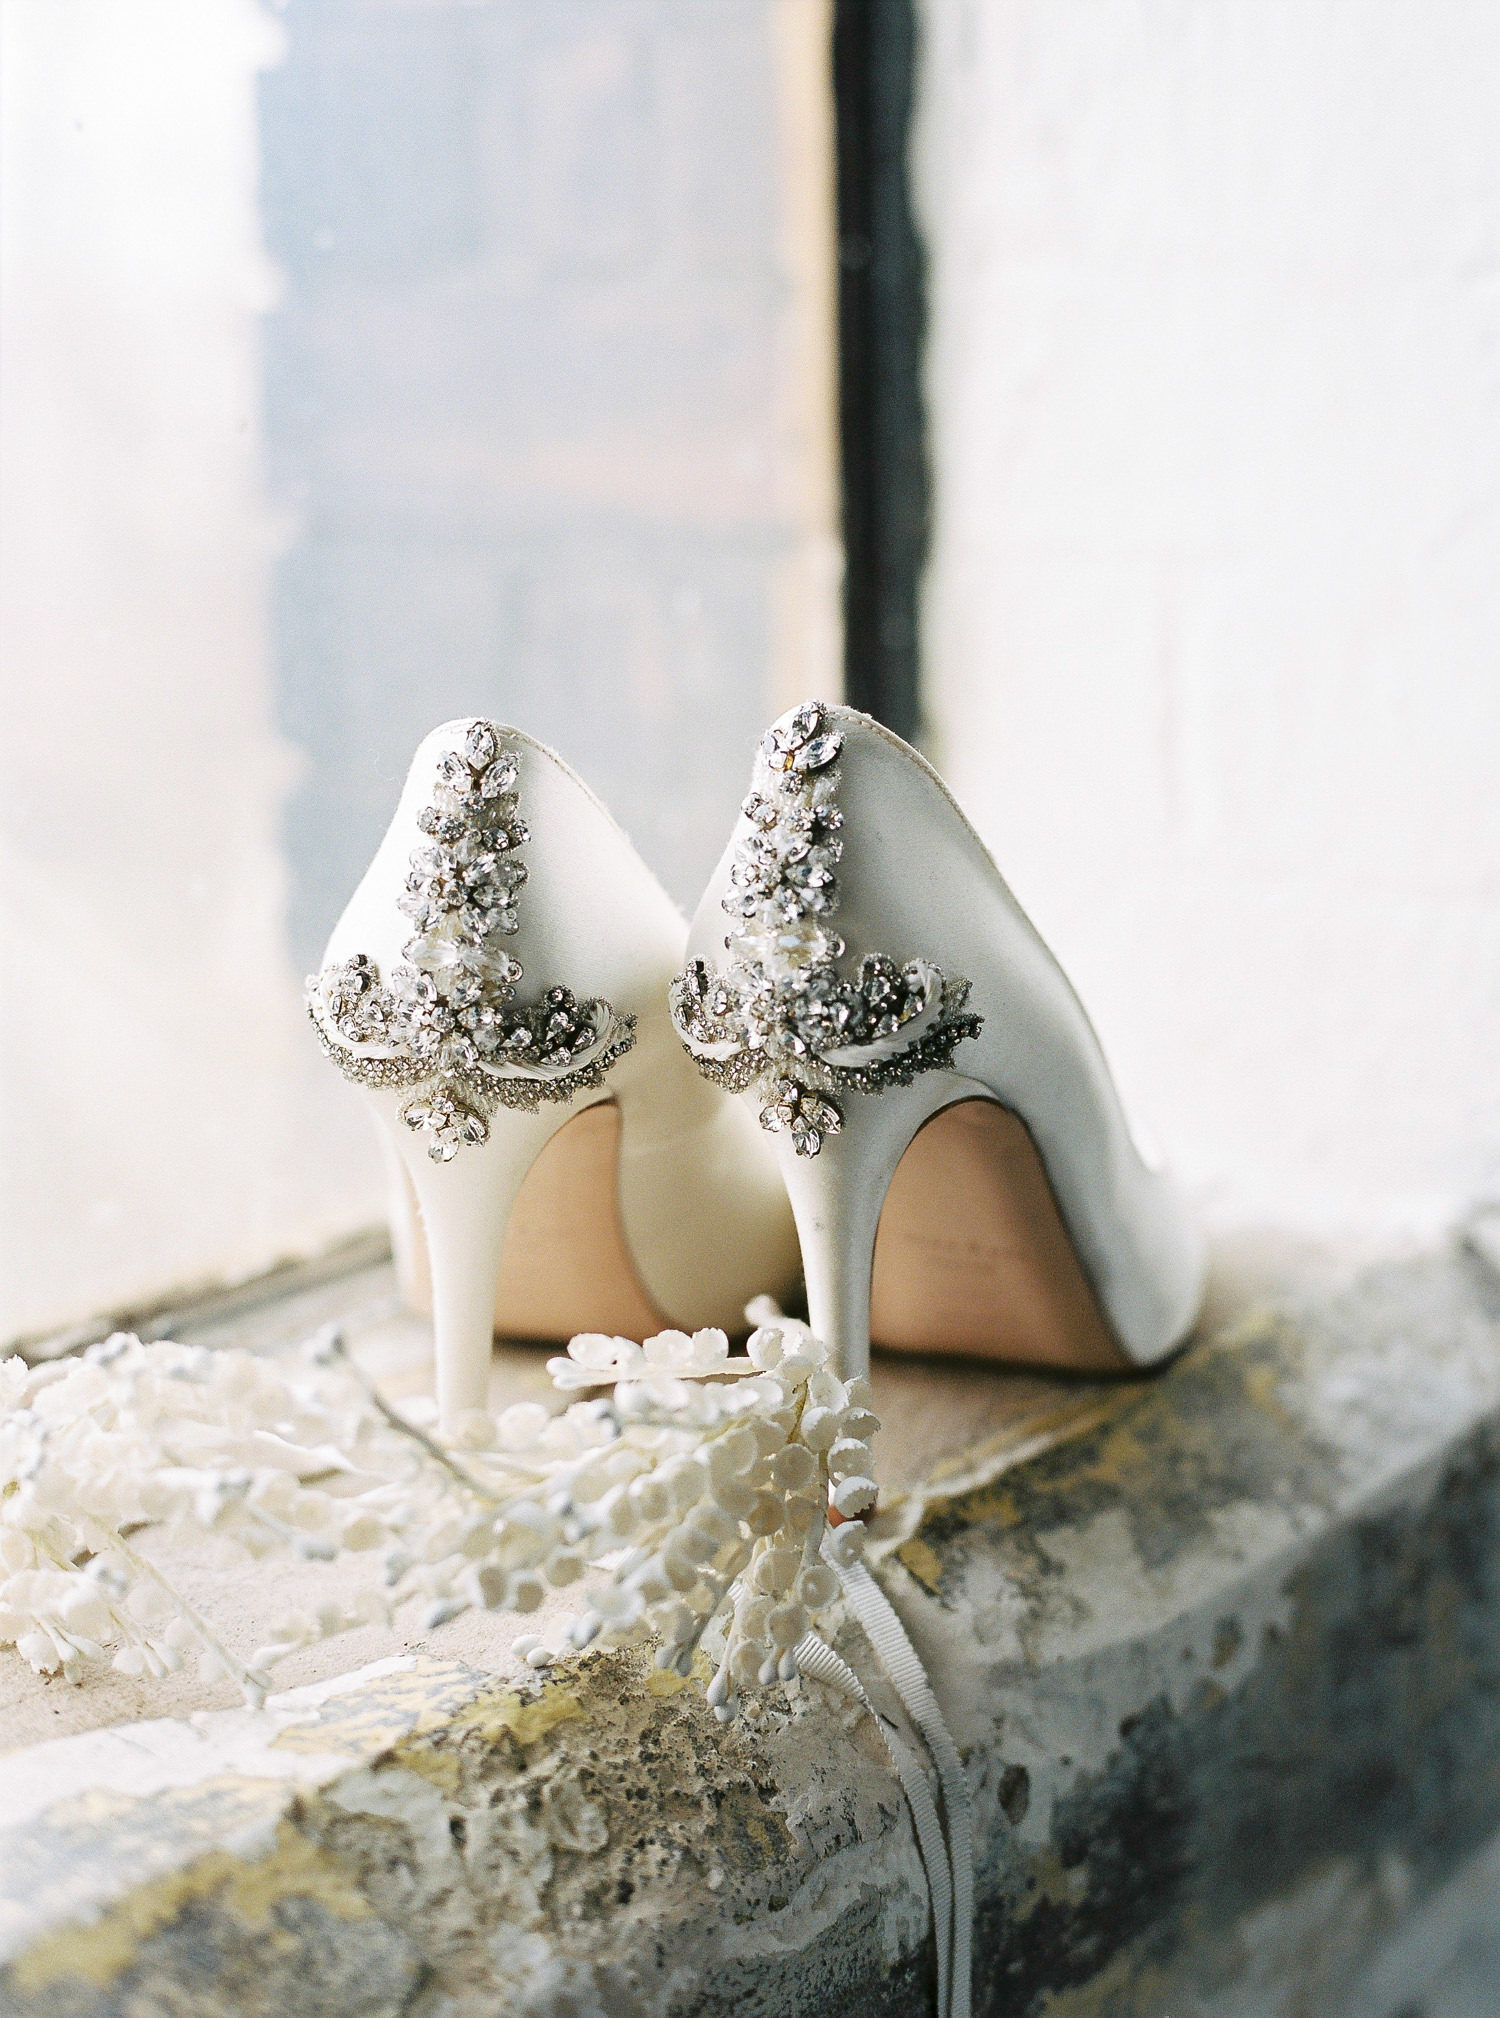 Freya Rose wedding shoes, Luna Bea headpiece